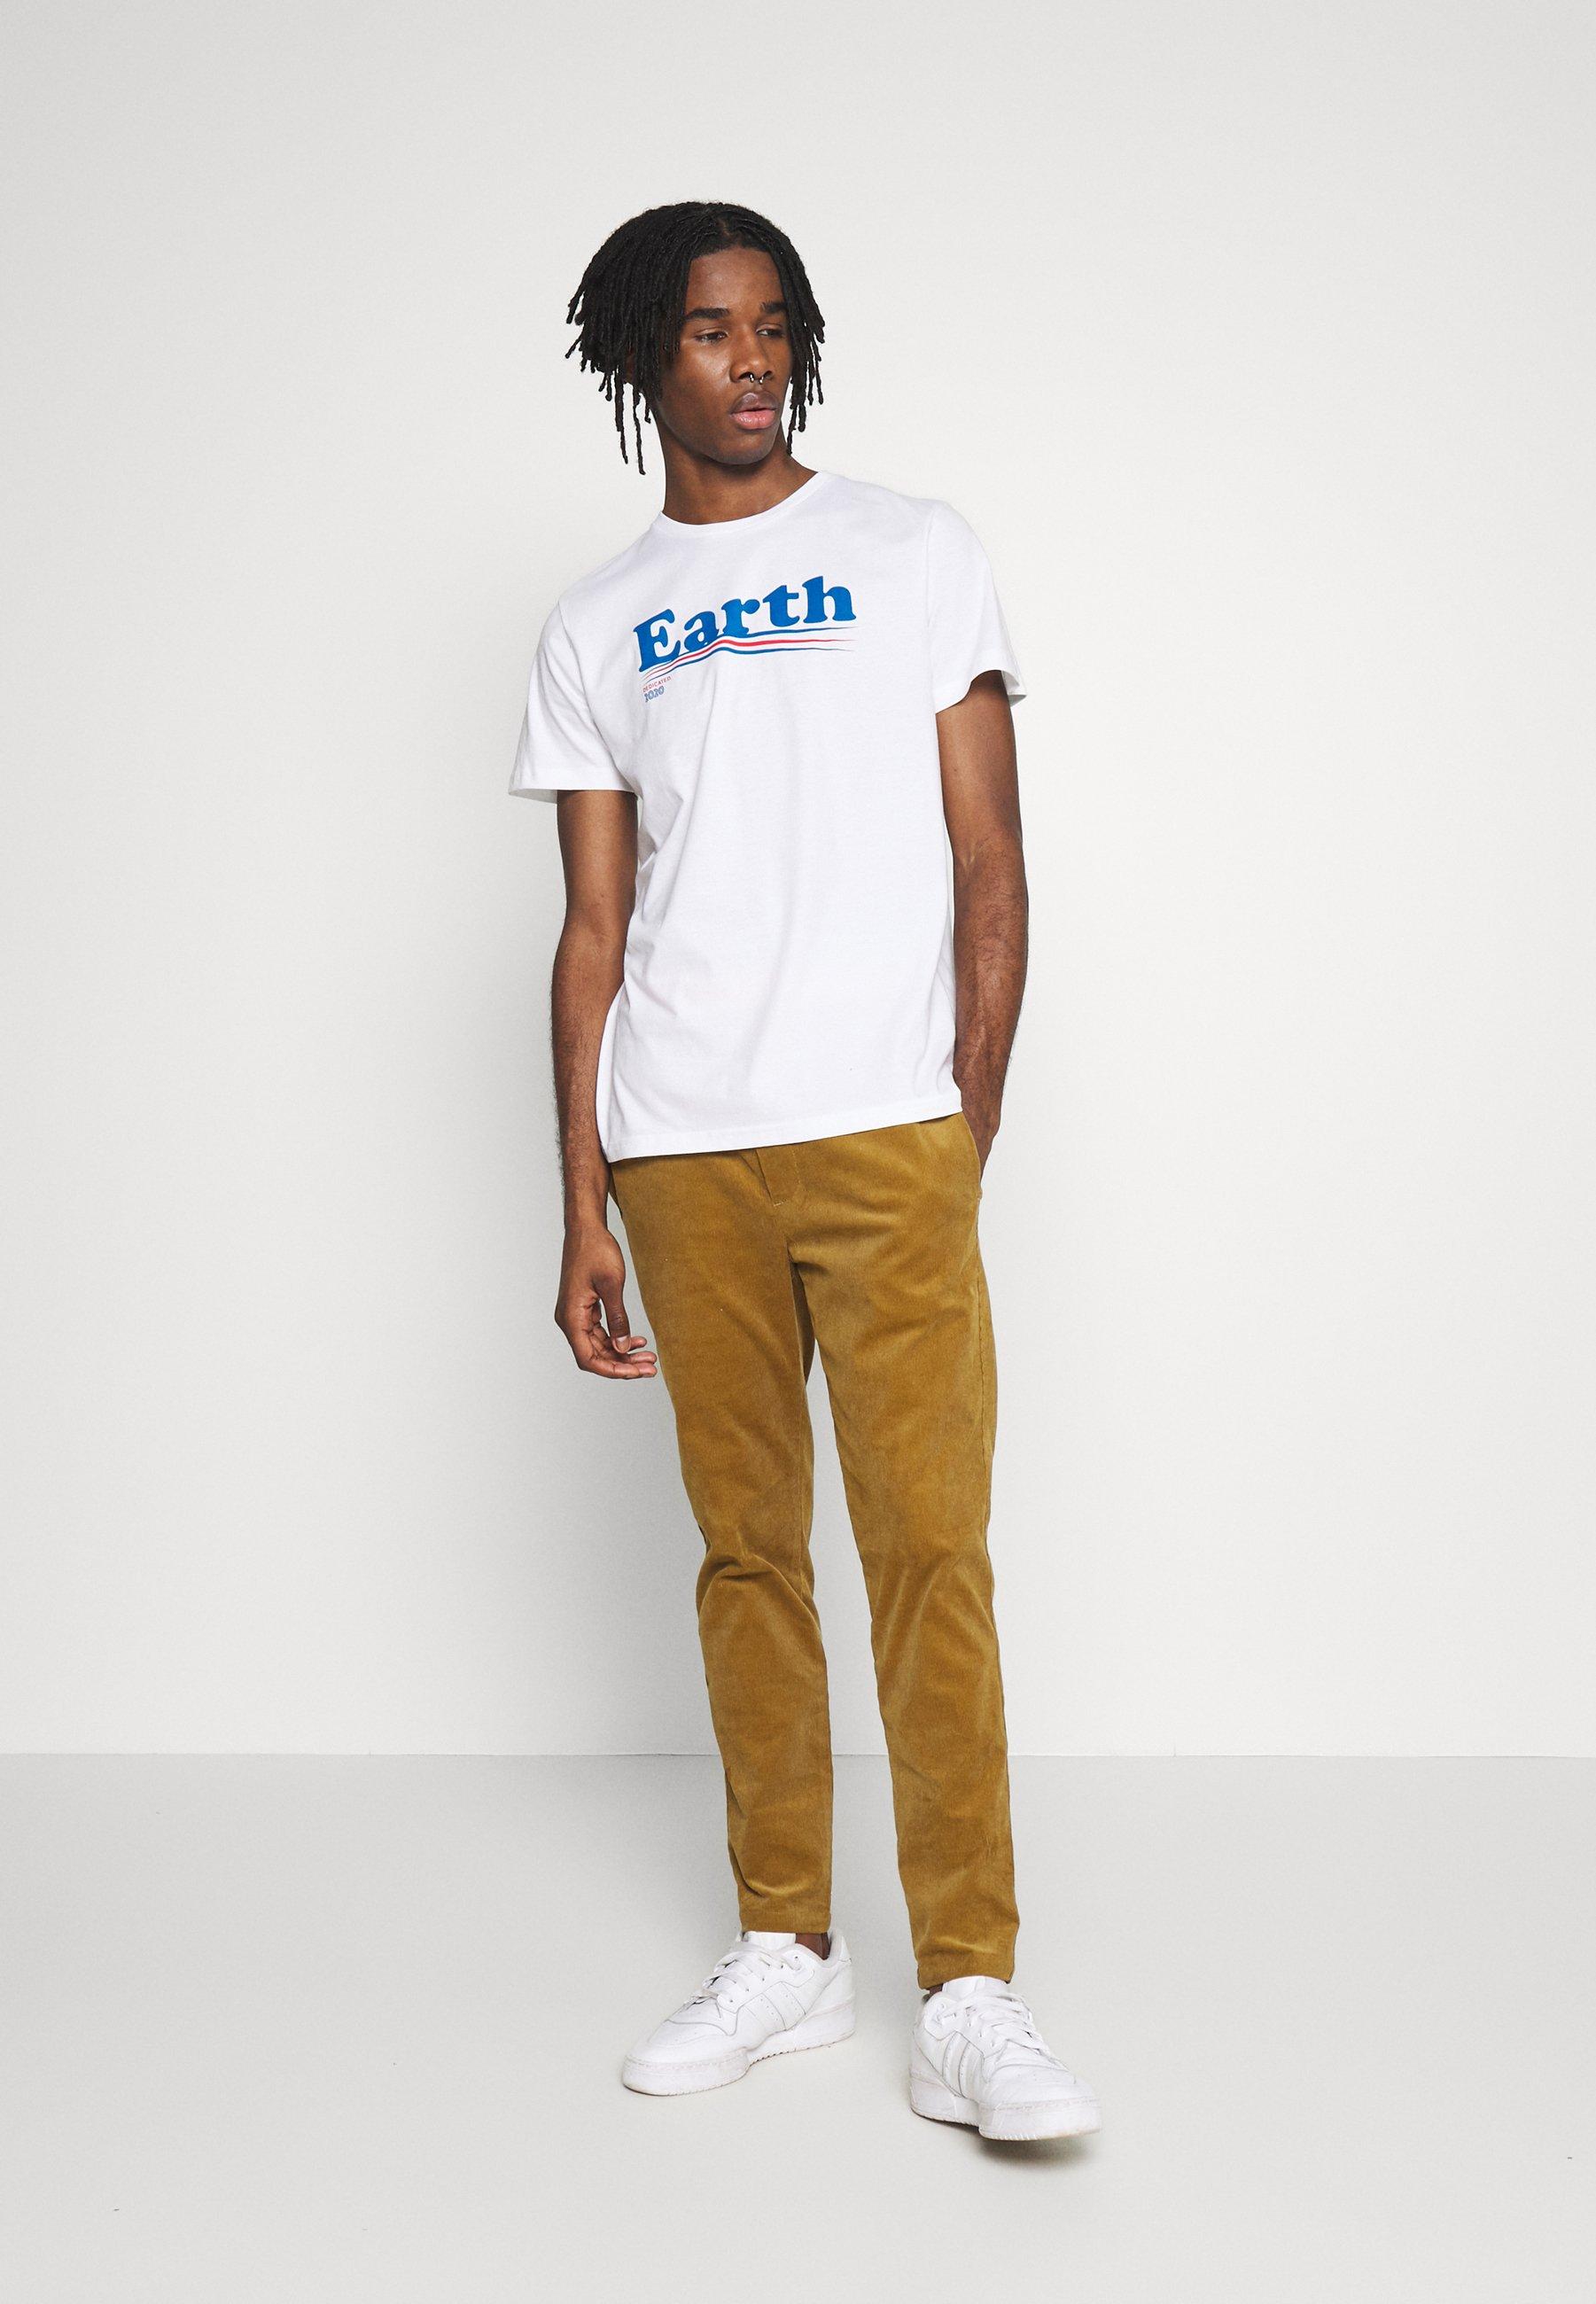 Dedicated T-SHIRT STOCKHOLM VOTE EARTH - T-shirt imprimé - white